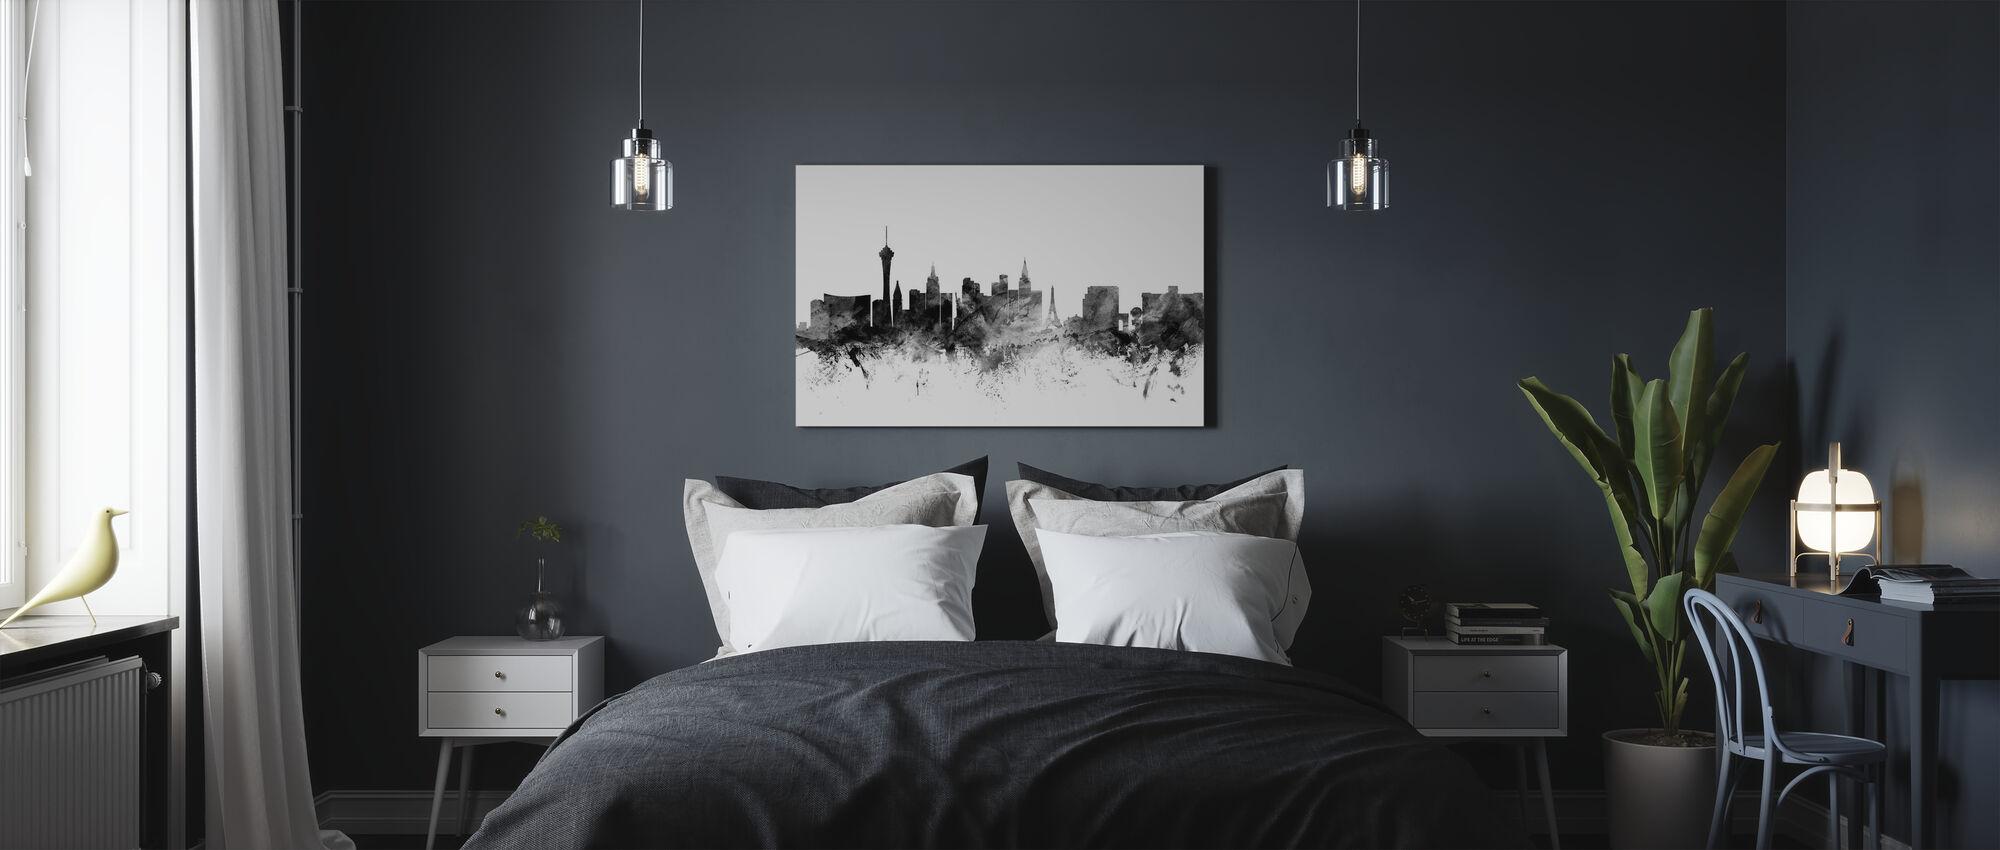 Las Vegas Skyline Zwart - Canvas print - Slaapkamer